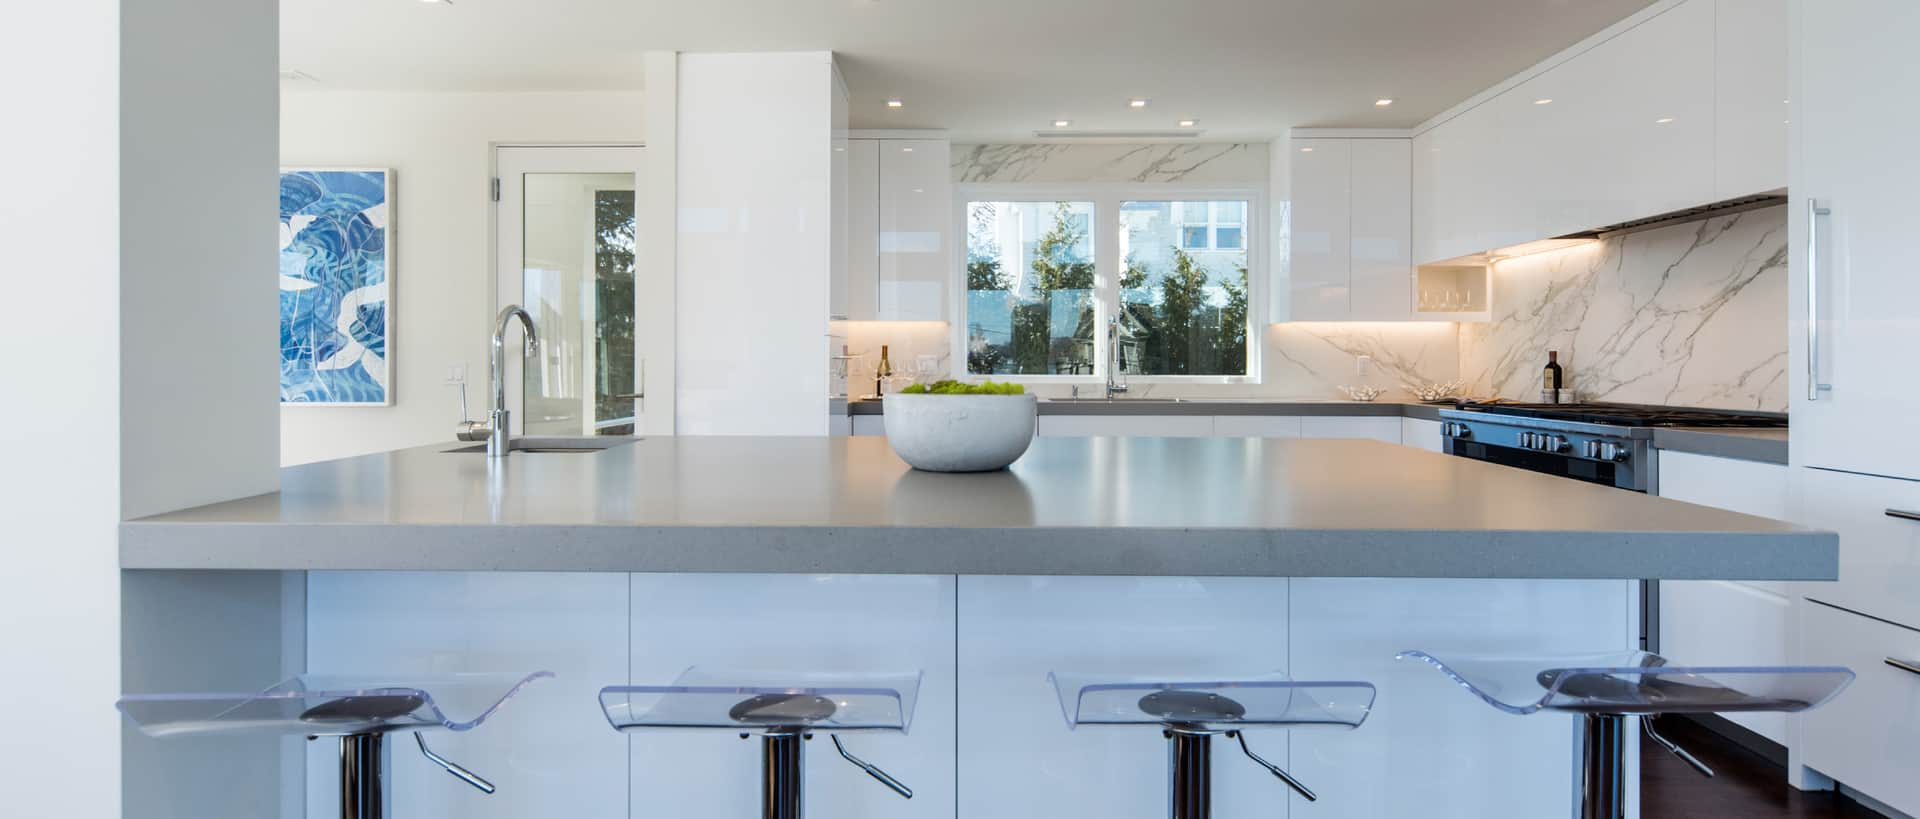 Floria Polverari | Vanderblue Real Estate | CT Real Estate